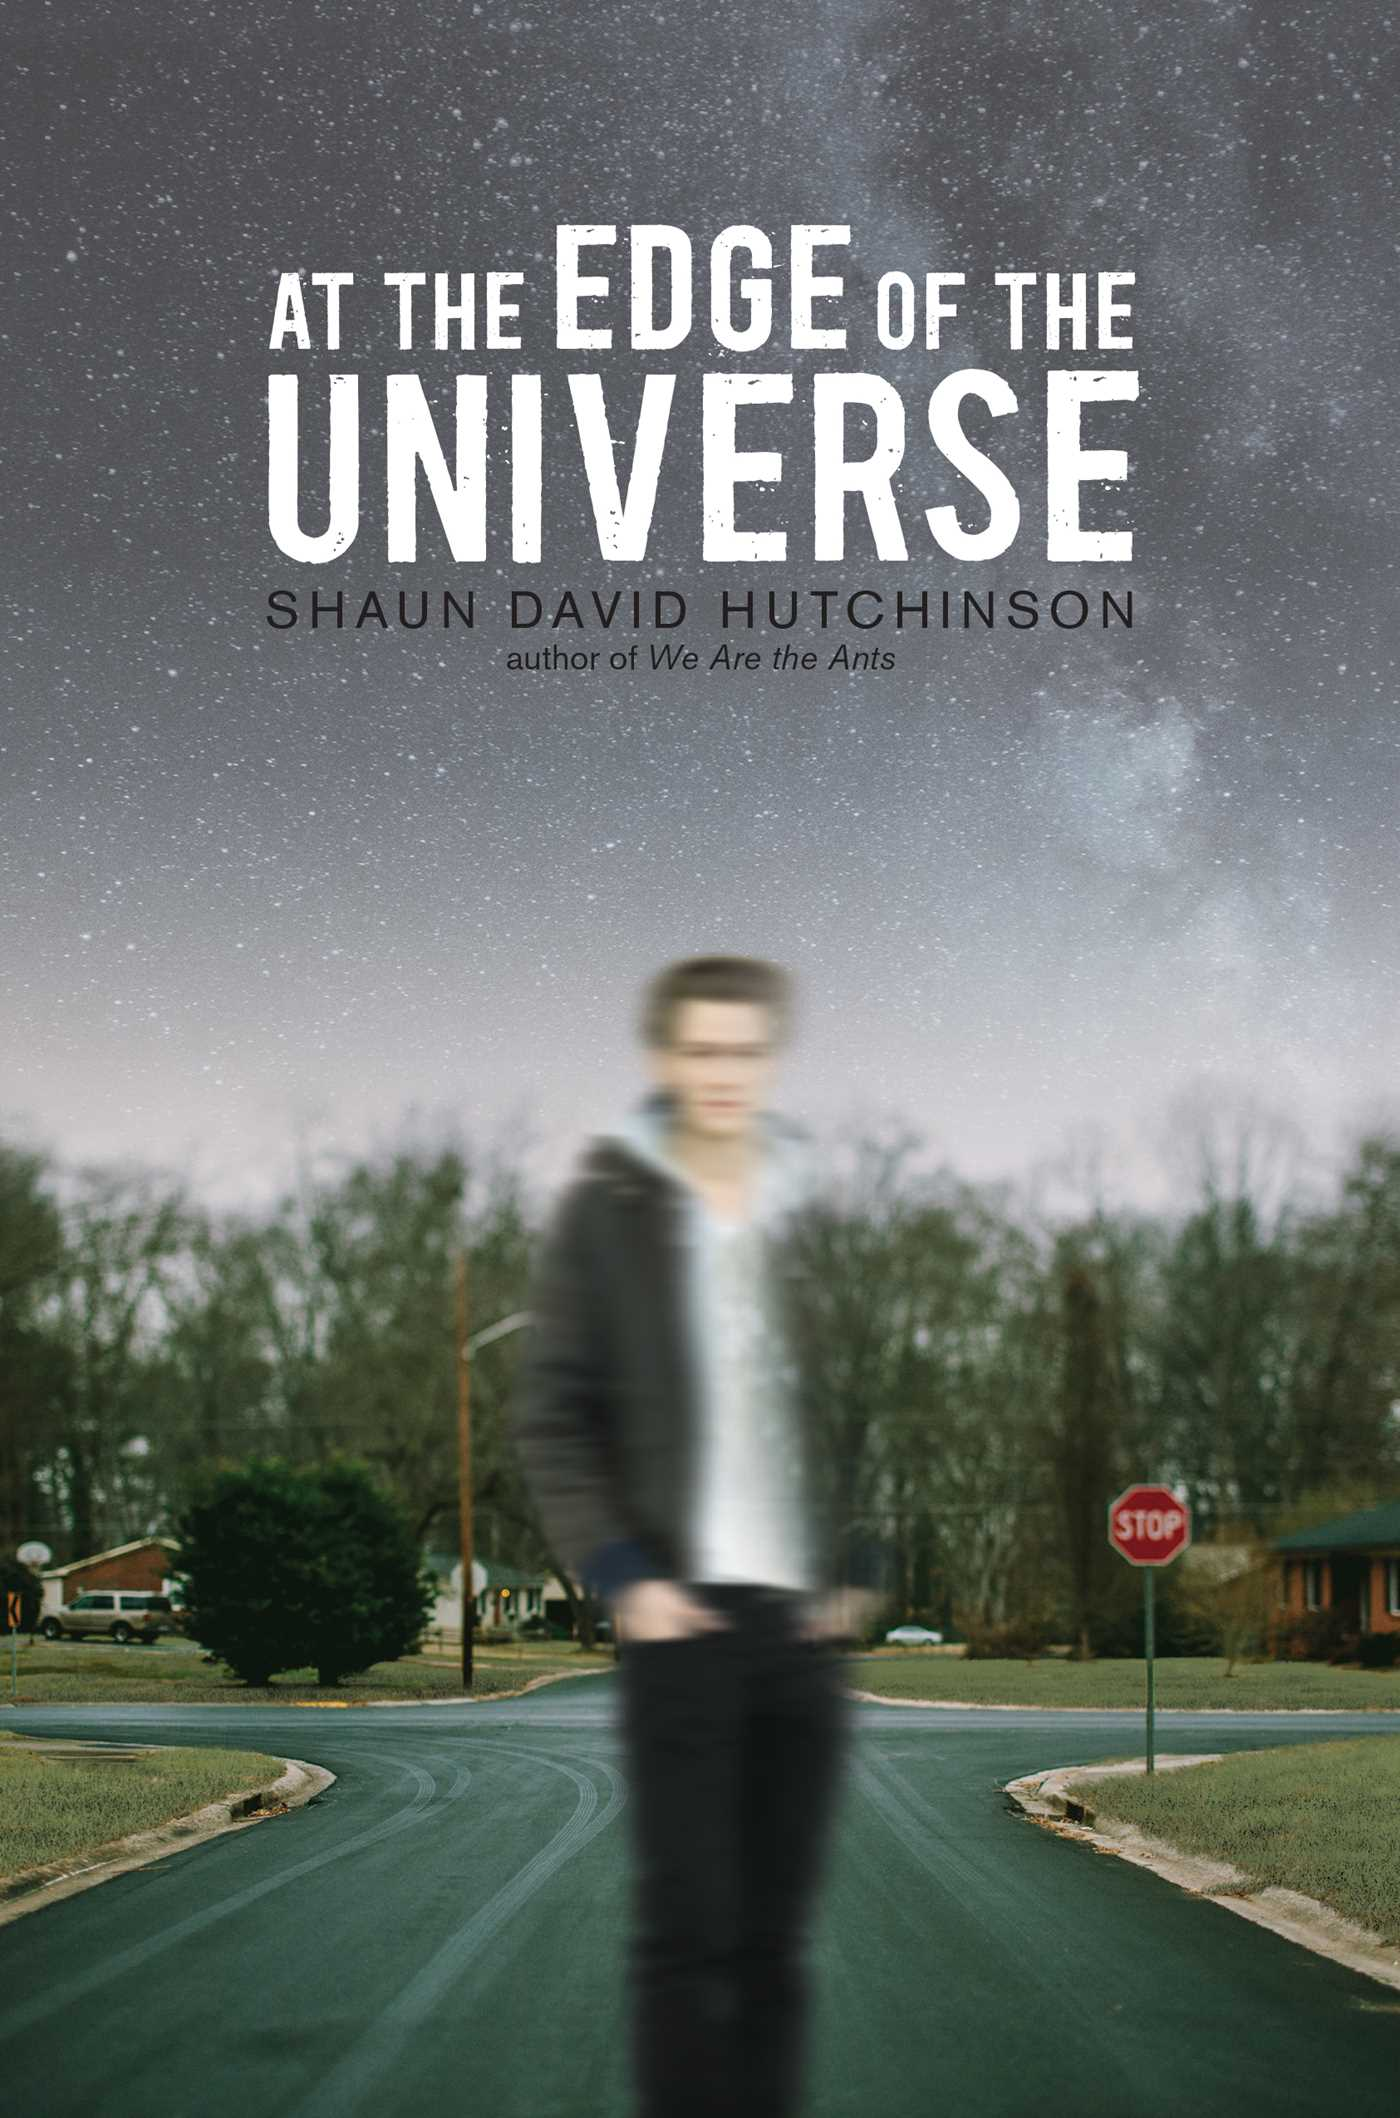 shaun-david-hutchison-at-the-edge-of-the-universe.jpg